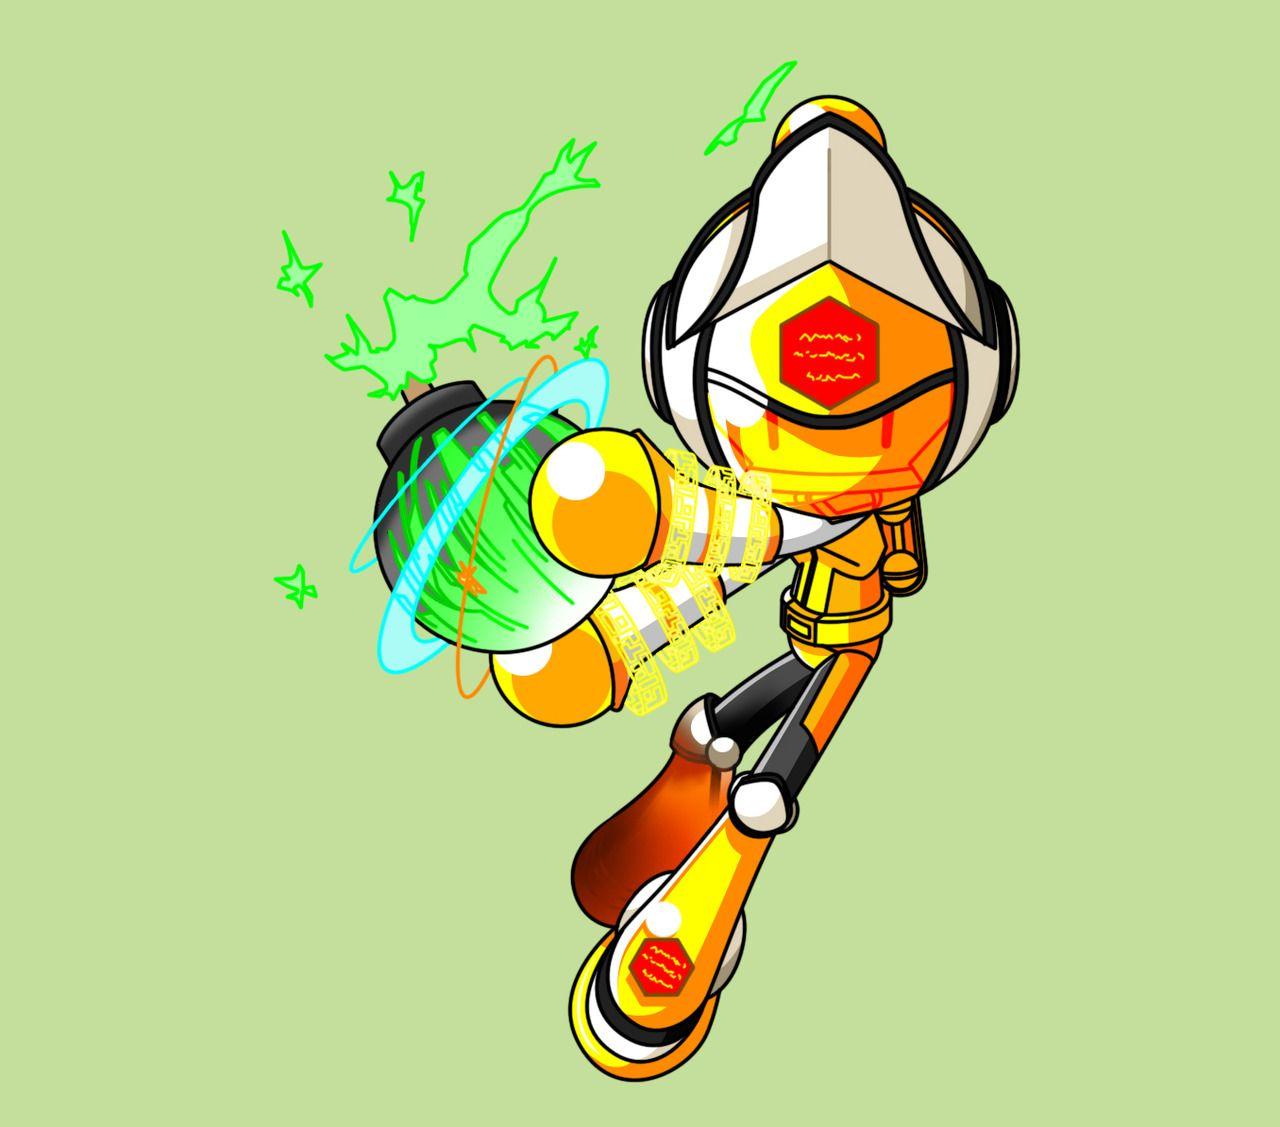 bomberman - Recherche Google | BomberMan | Character art ...